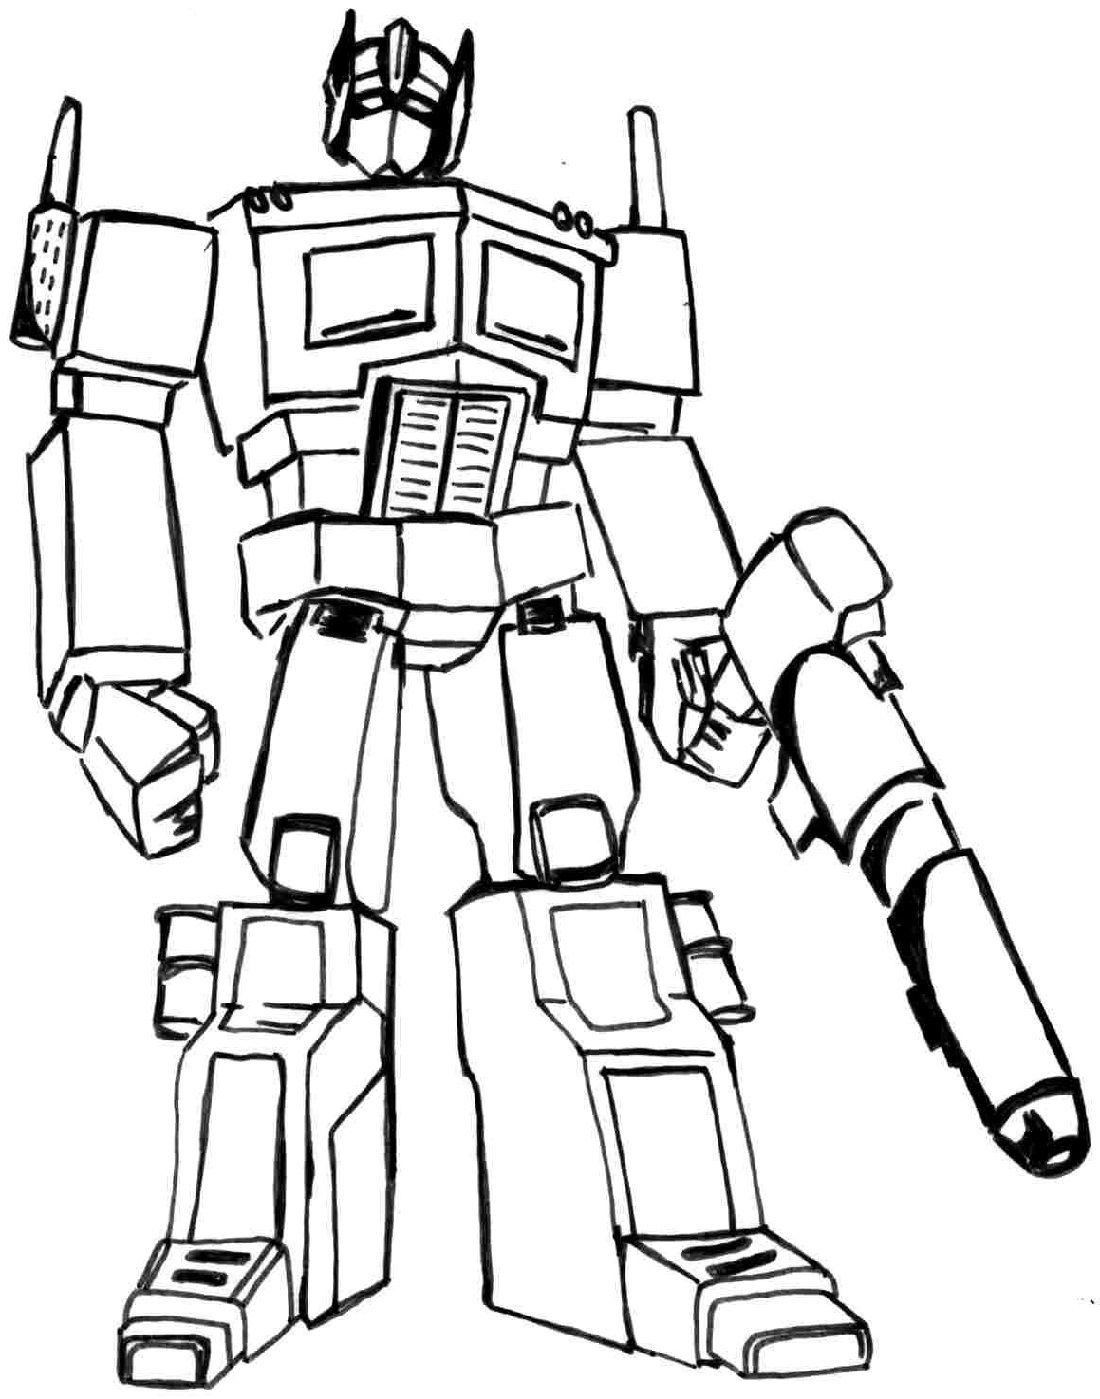 Transformer Optimus Prime Coloring Pages For Kids 2019 Educative Printable Arte Ninos